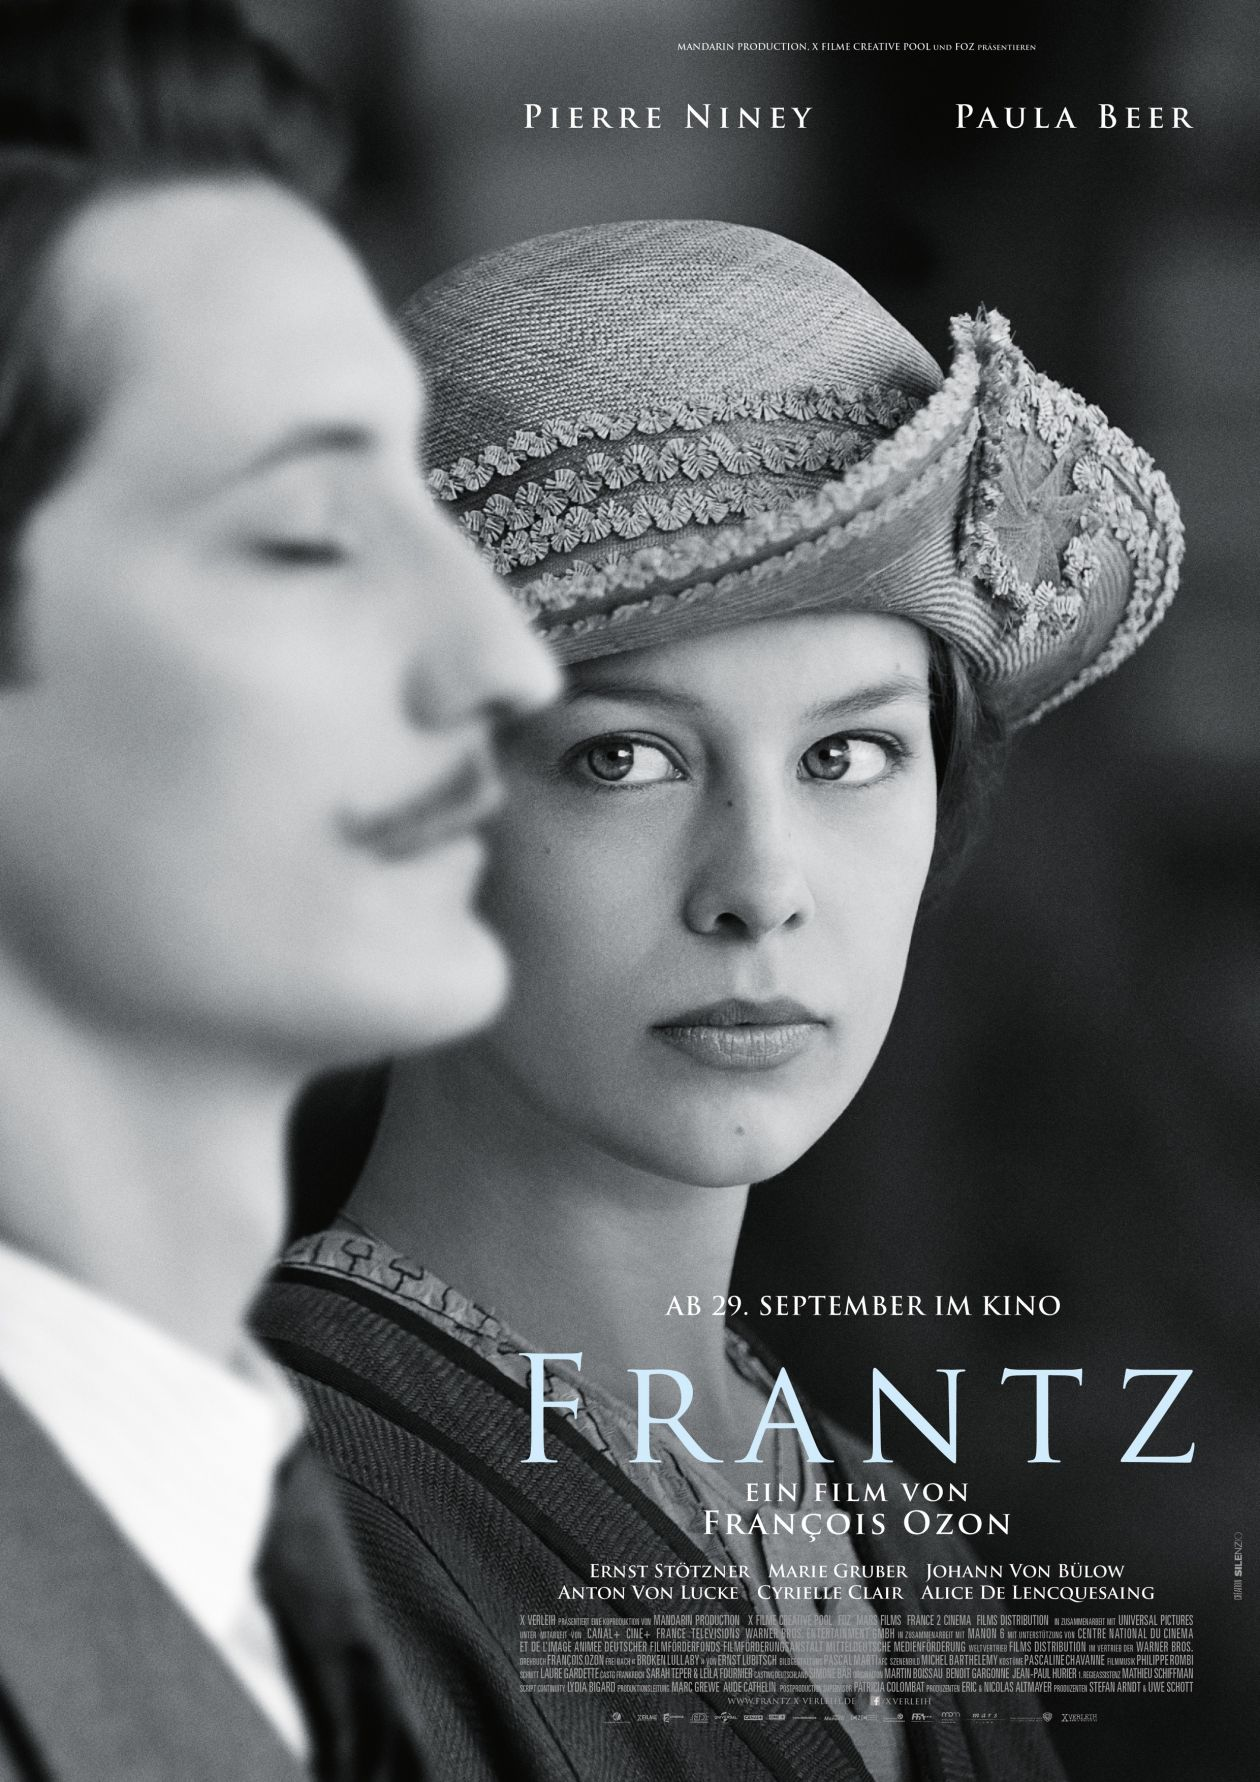 Paula BEER | FRANTZ | François OZON